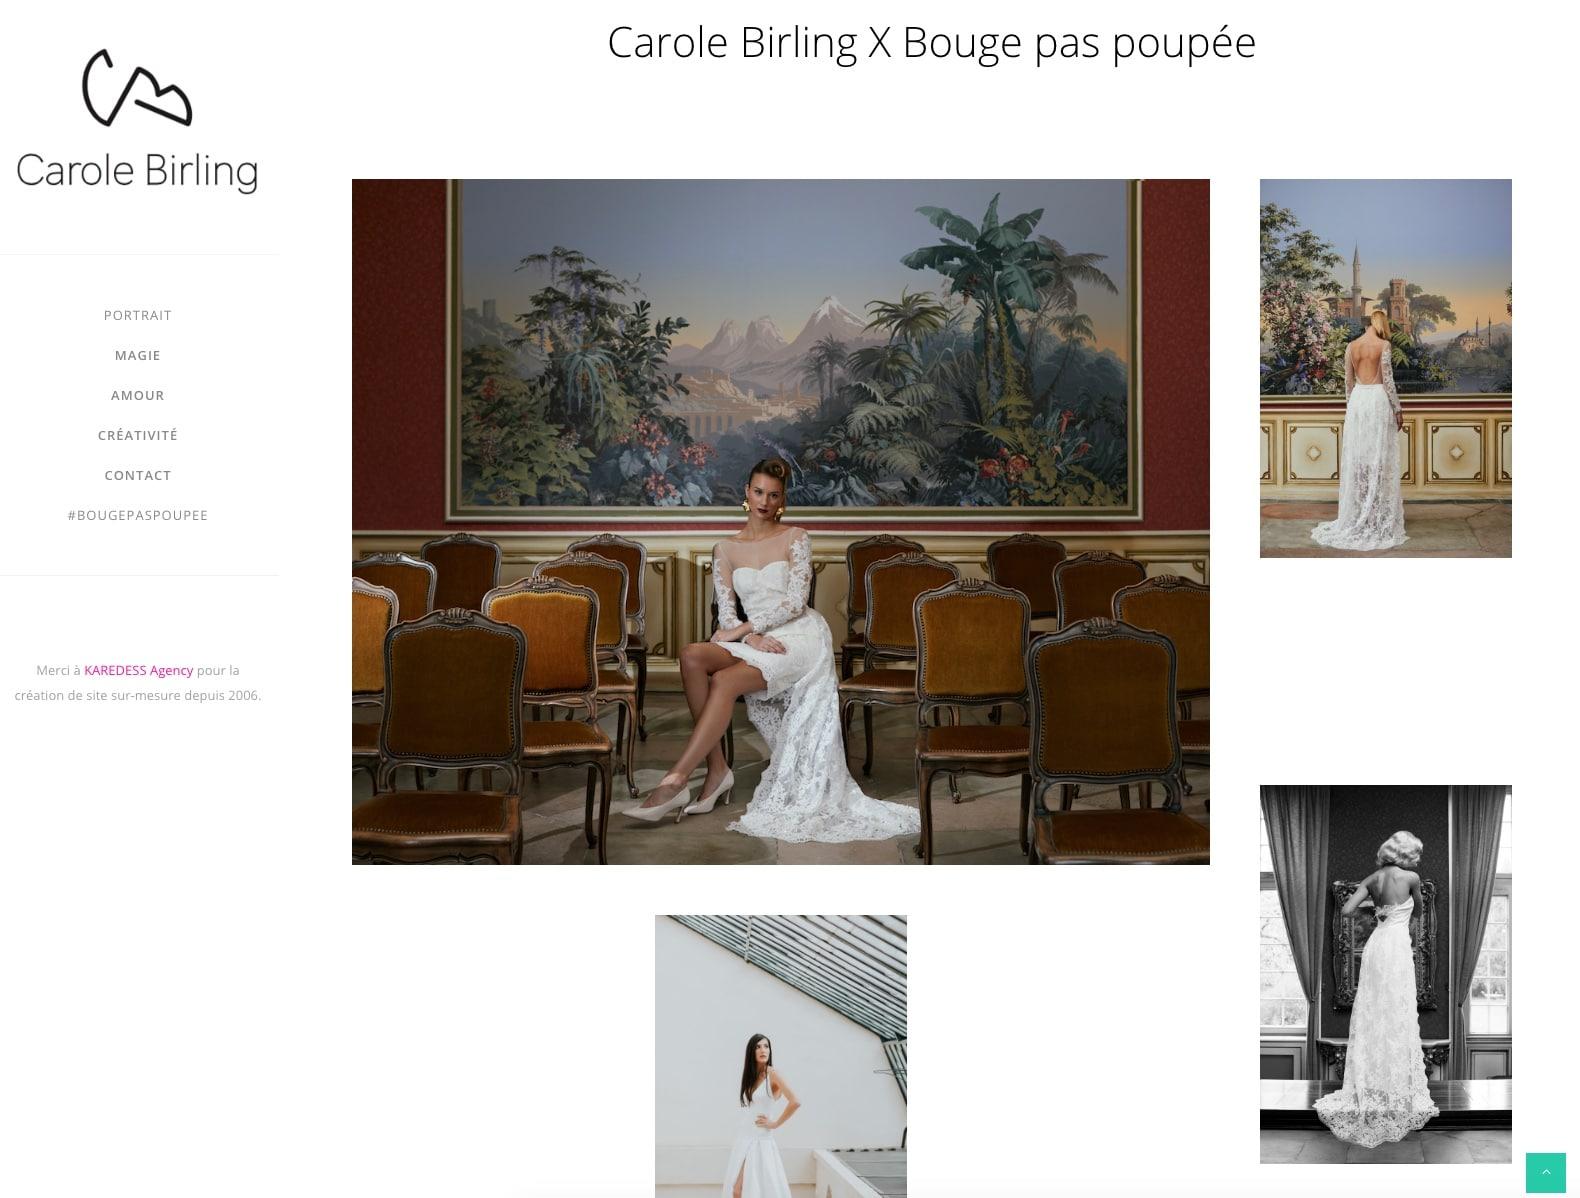 Photos mariage de Carole Birling , cliente de l'agence web à Mulhouse, Karedess agency